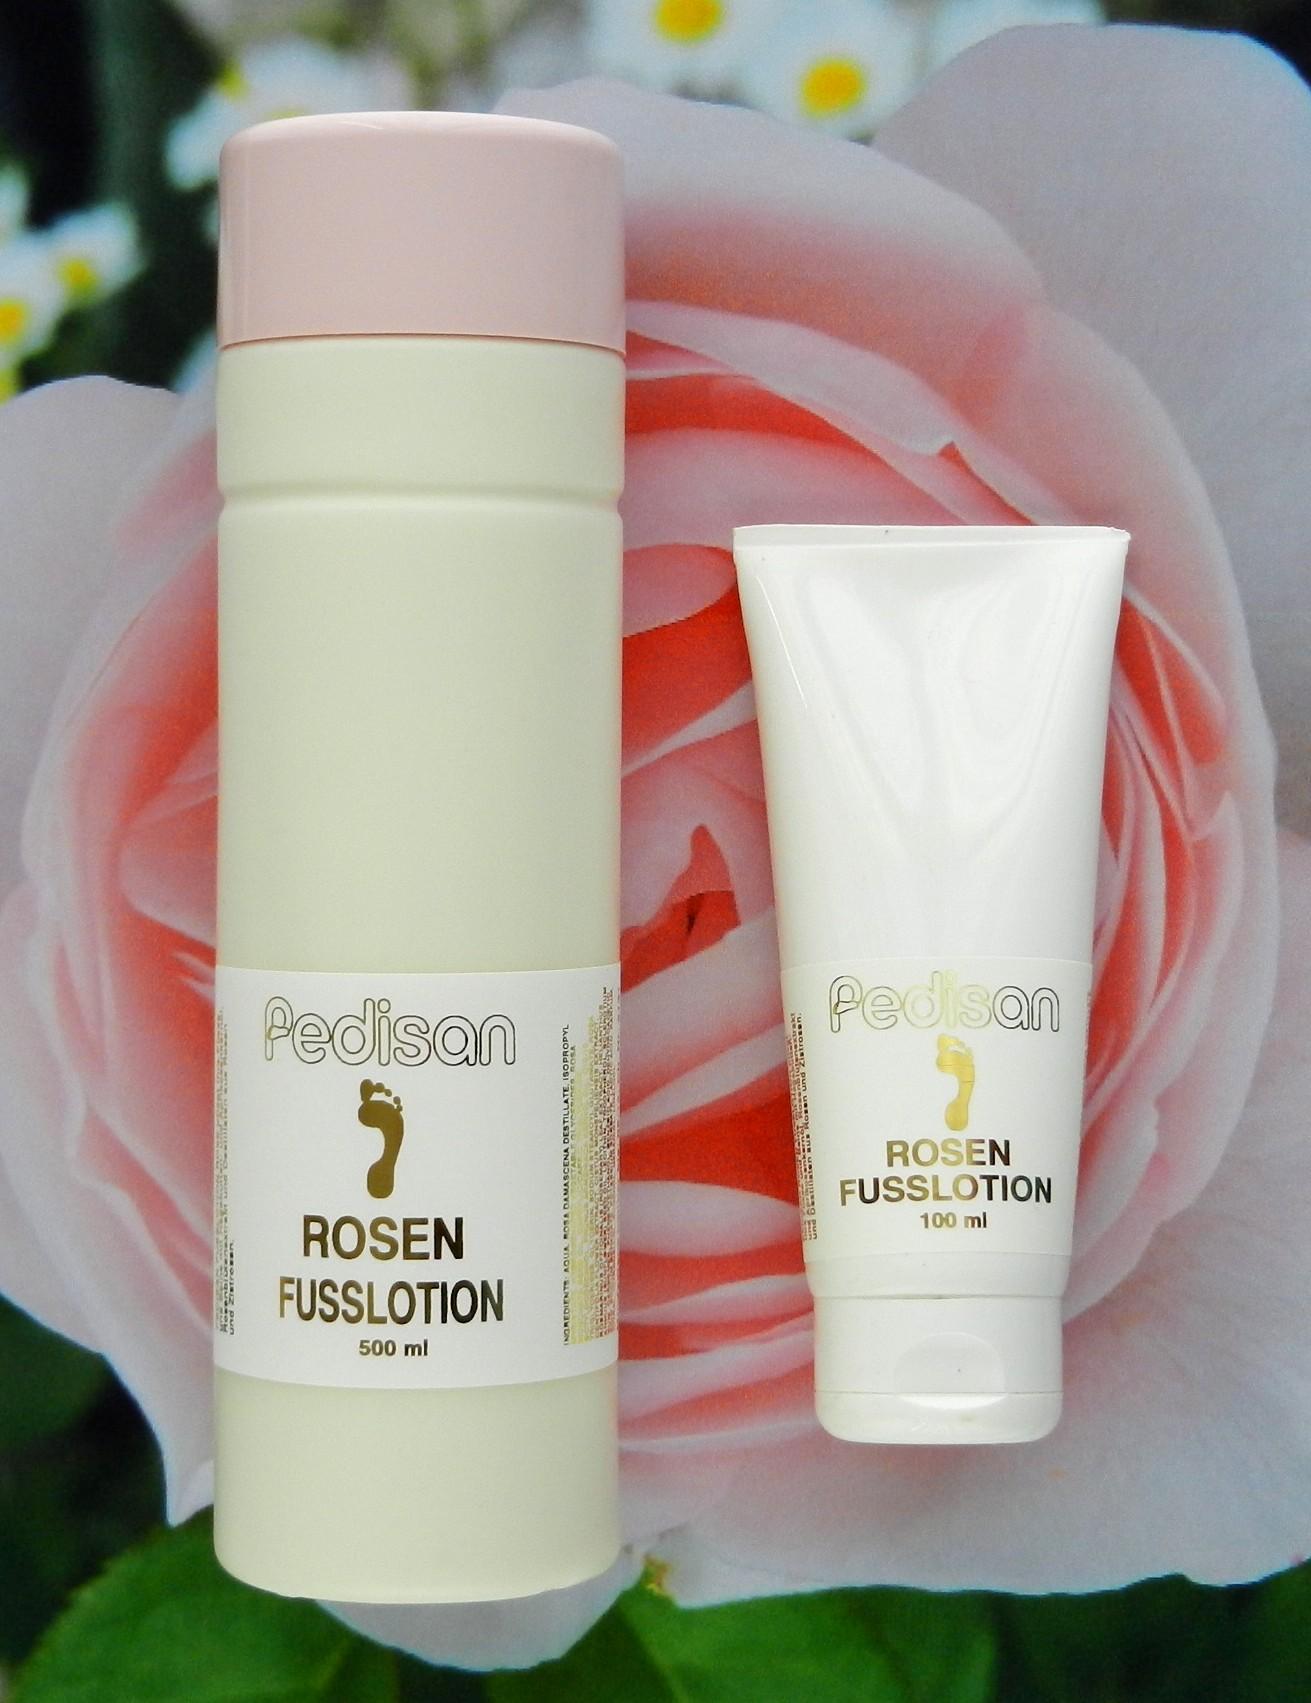 ROSEN FUSSLOTION